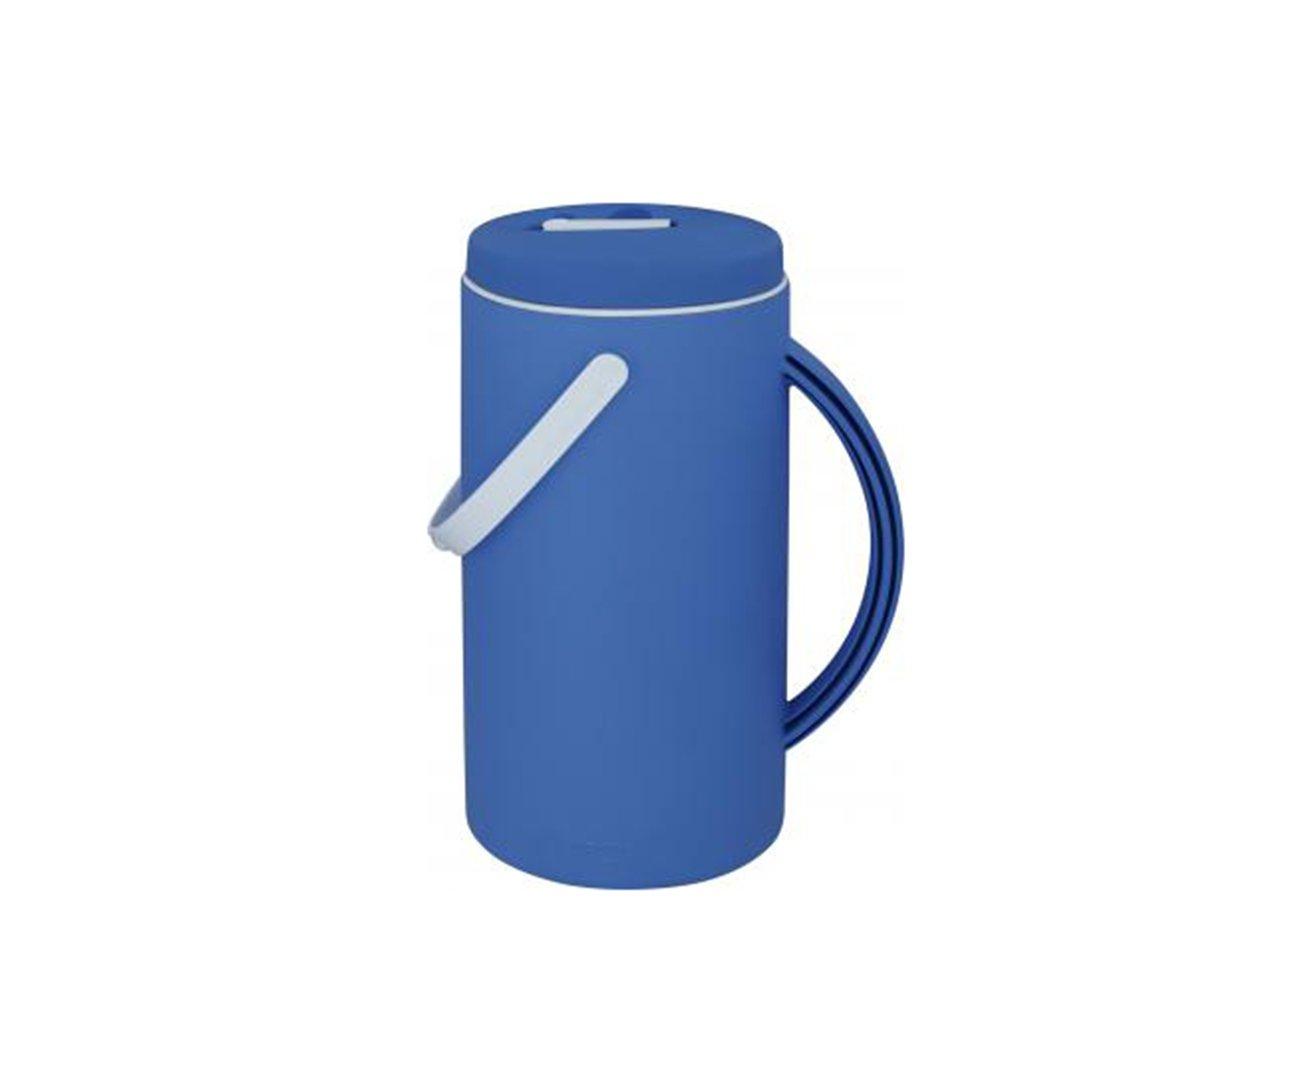 Jarra Térmica Nativa 2,5 Litros Azul Ref. 25108001 - Mor